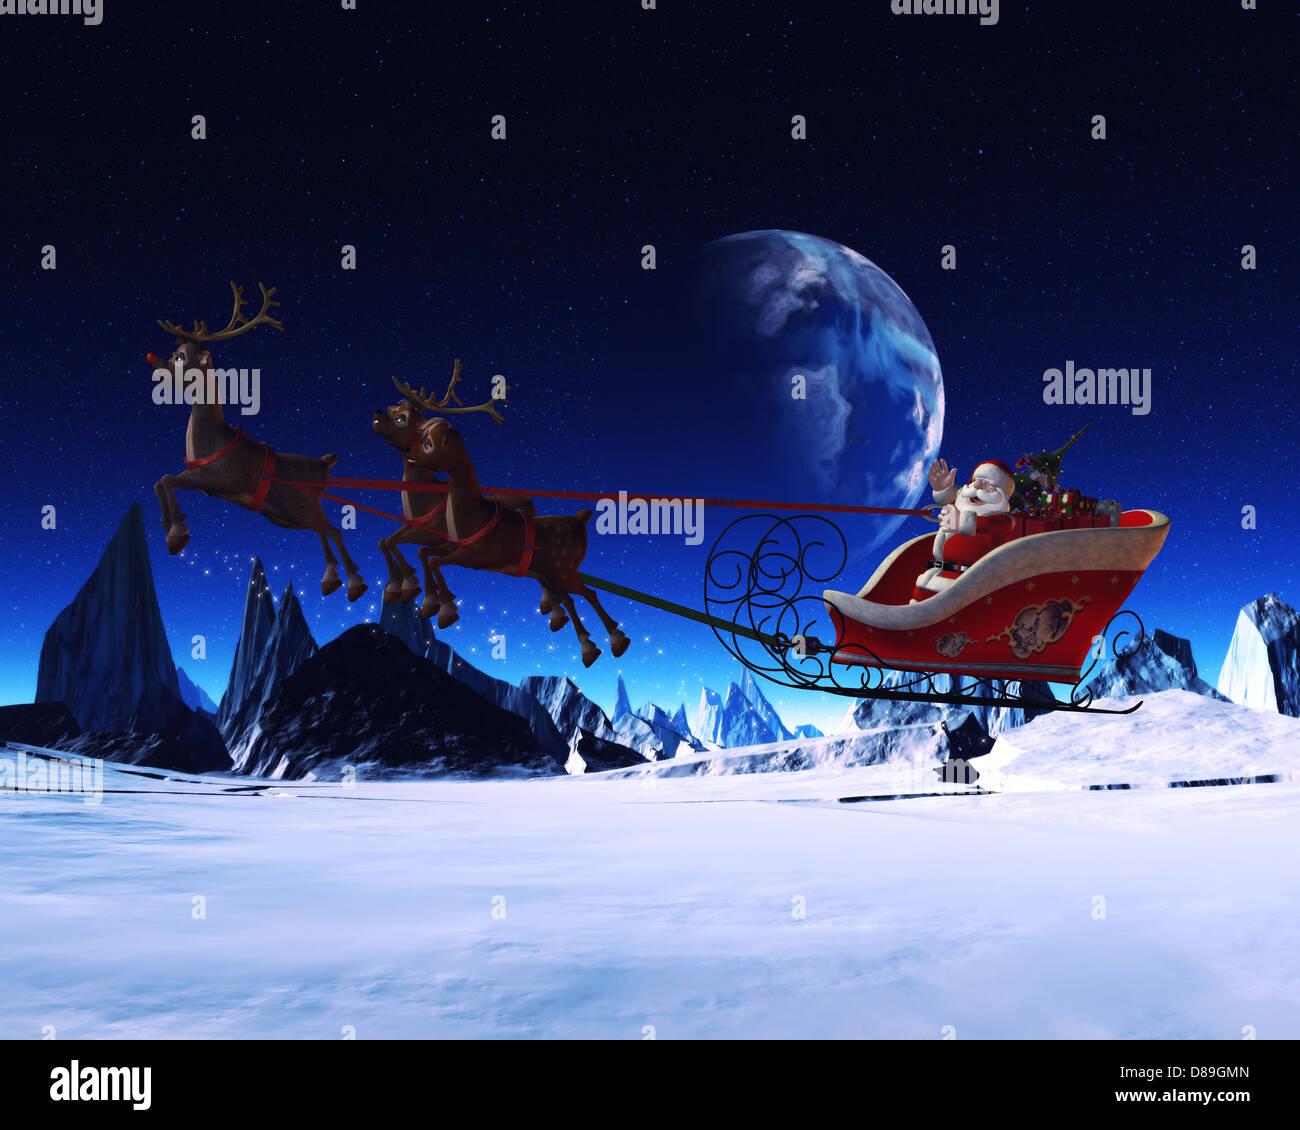 reindeer sleigh fly stockfotos reindeer sleigh fly. Black Bedroom Furniture Sets. Home Design Ideas